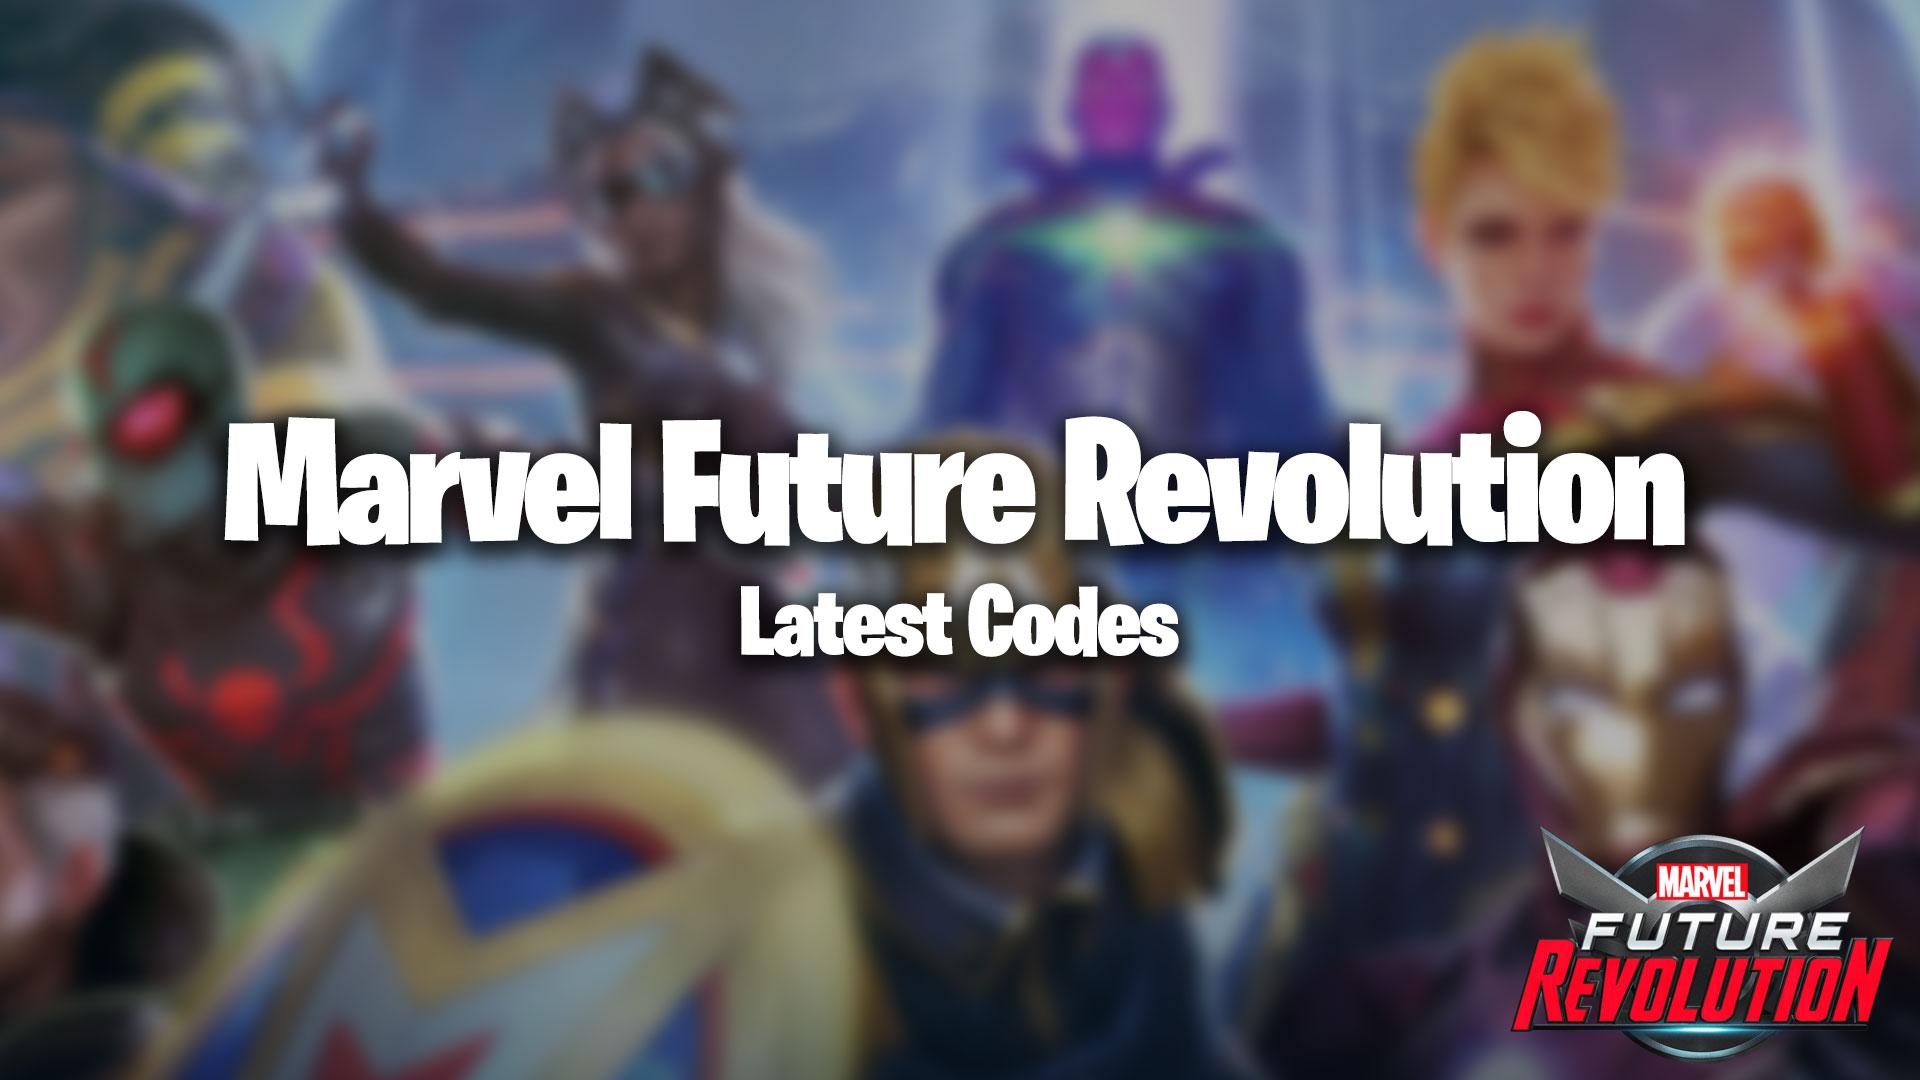 Codes de la révolution future de Marvel